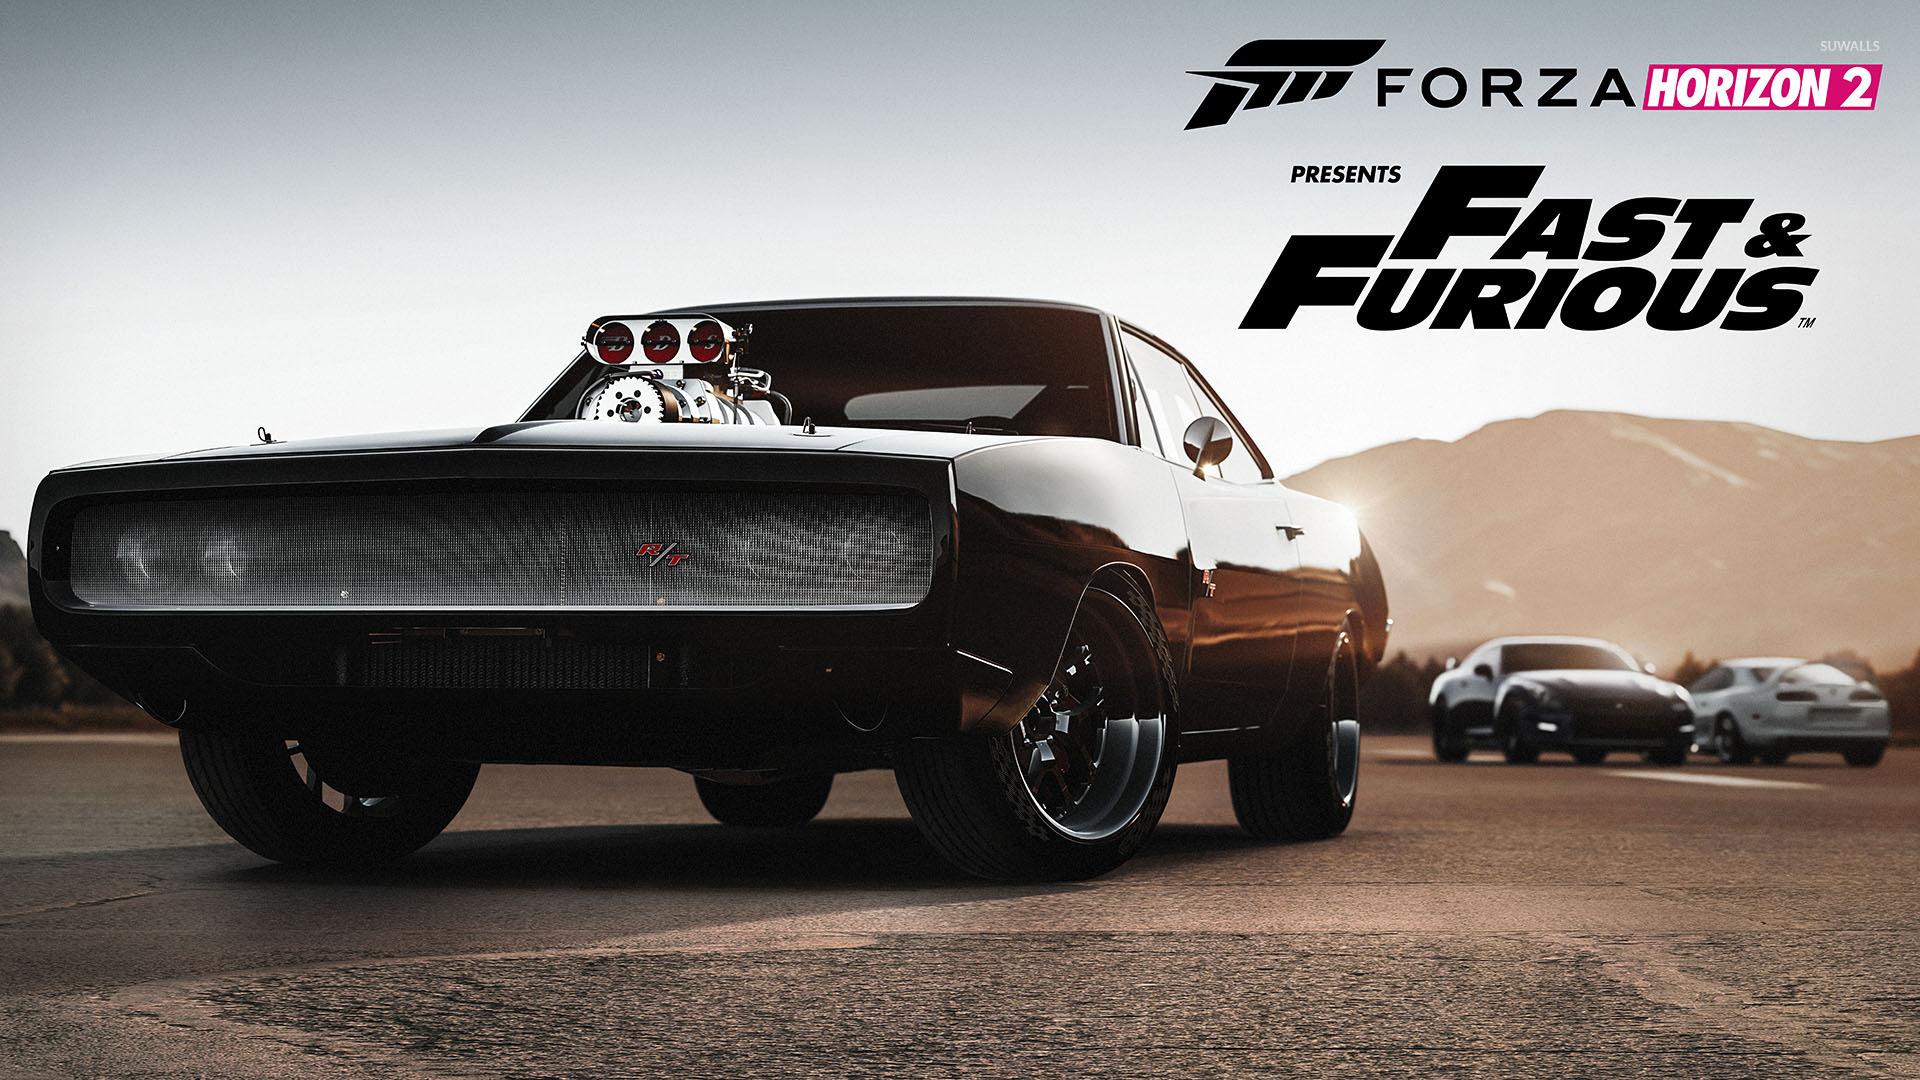 Forza Horizon 2 Presents Fast & Furious wallpaper